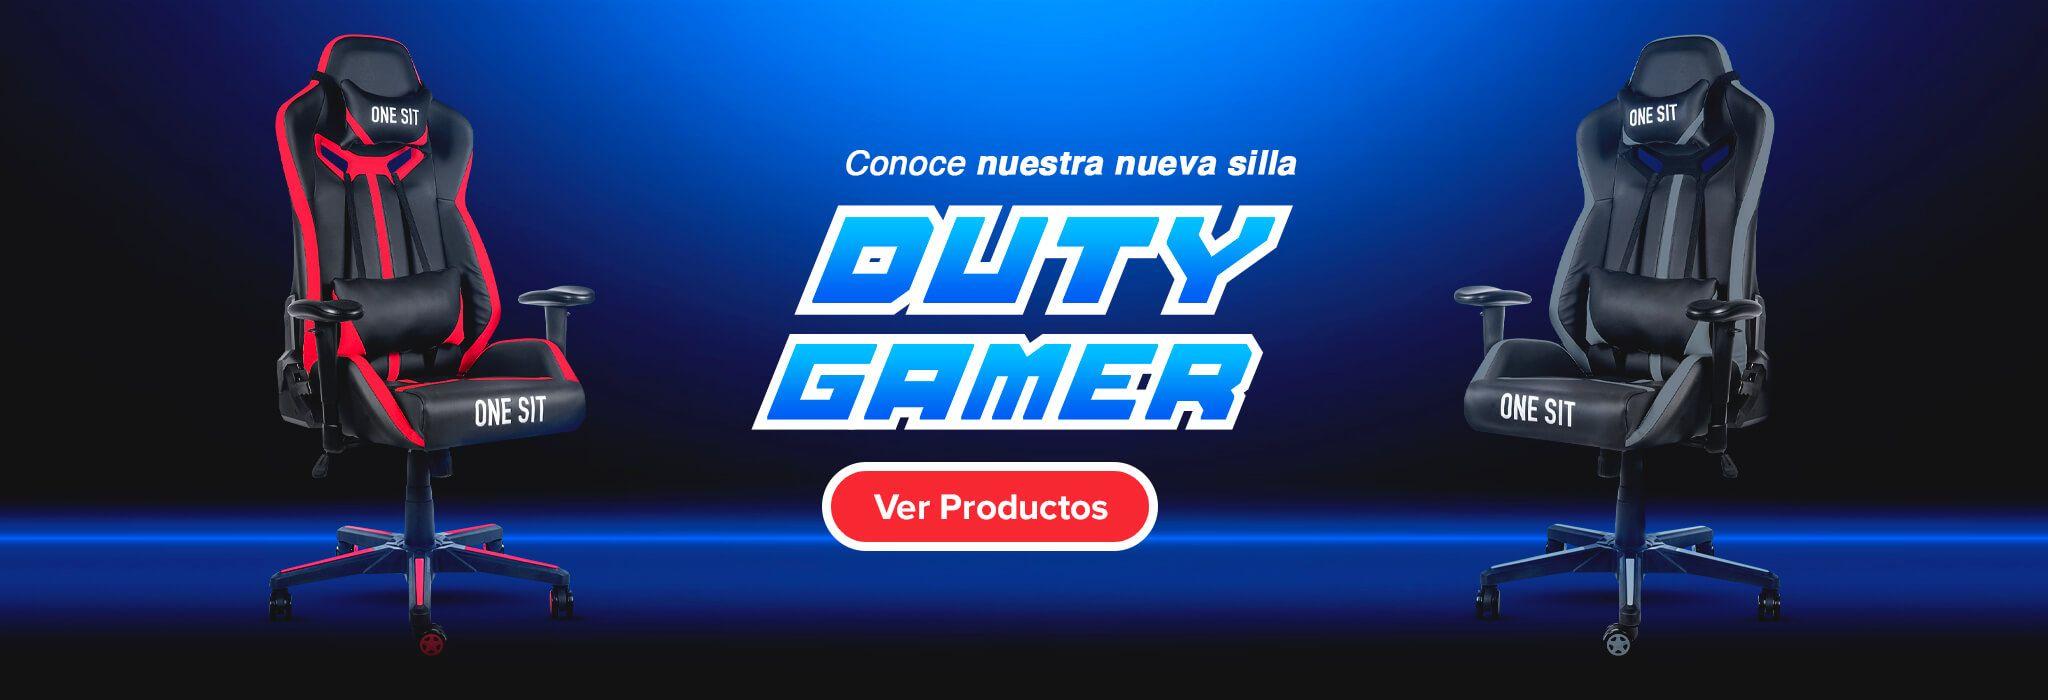 bannerMini gamer